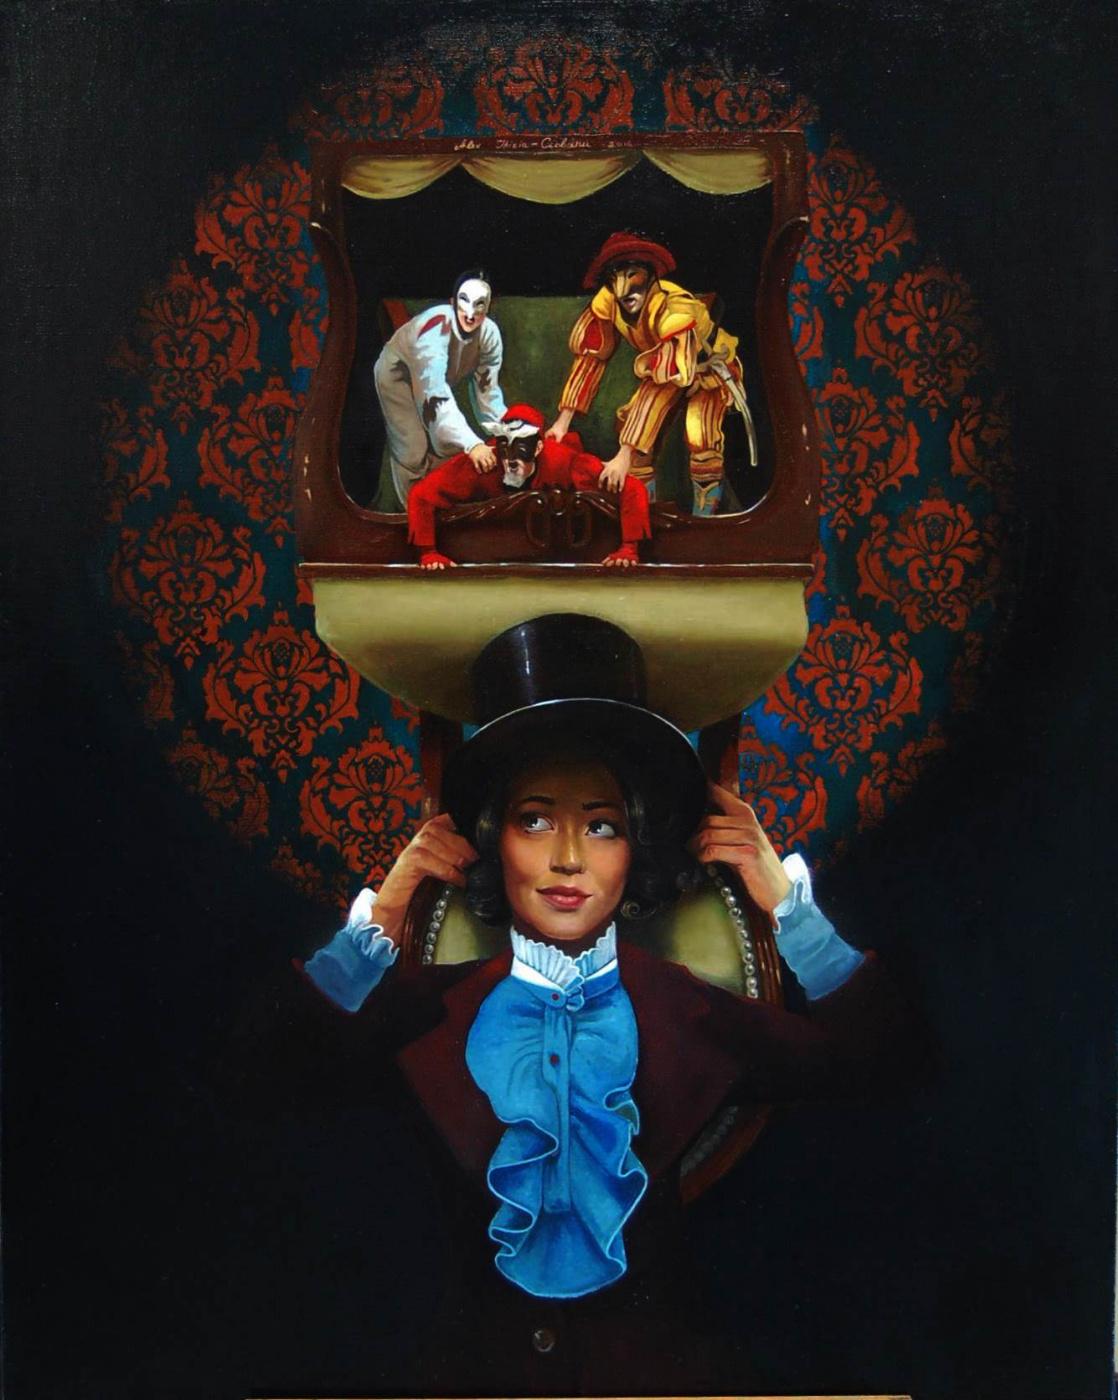 Alexander Giza-Ciobanu. In the light of the spotlight